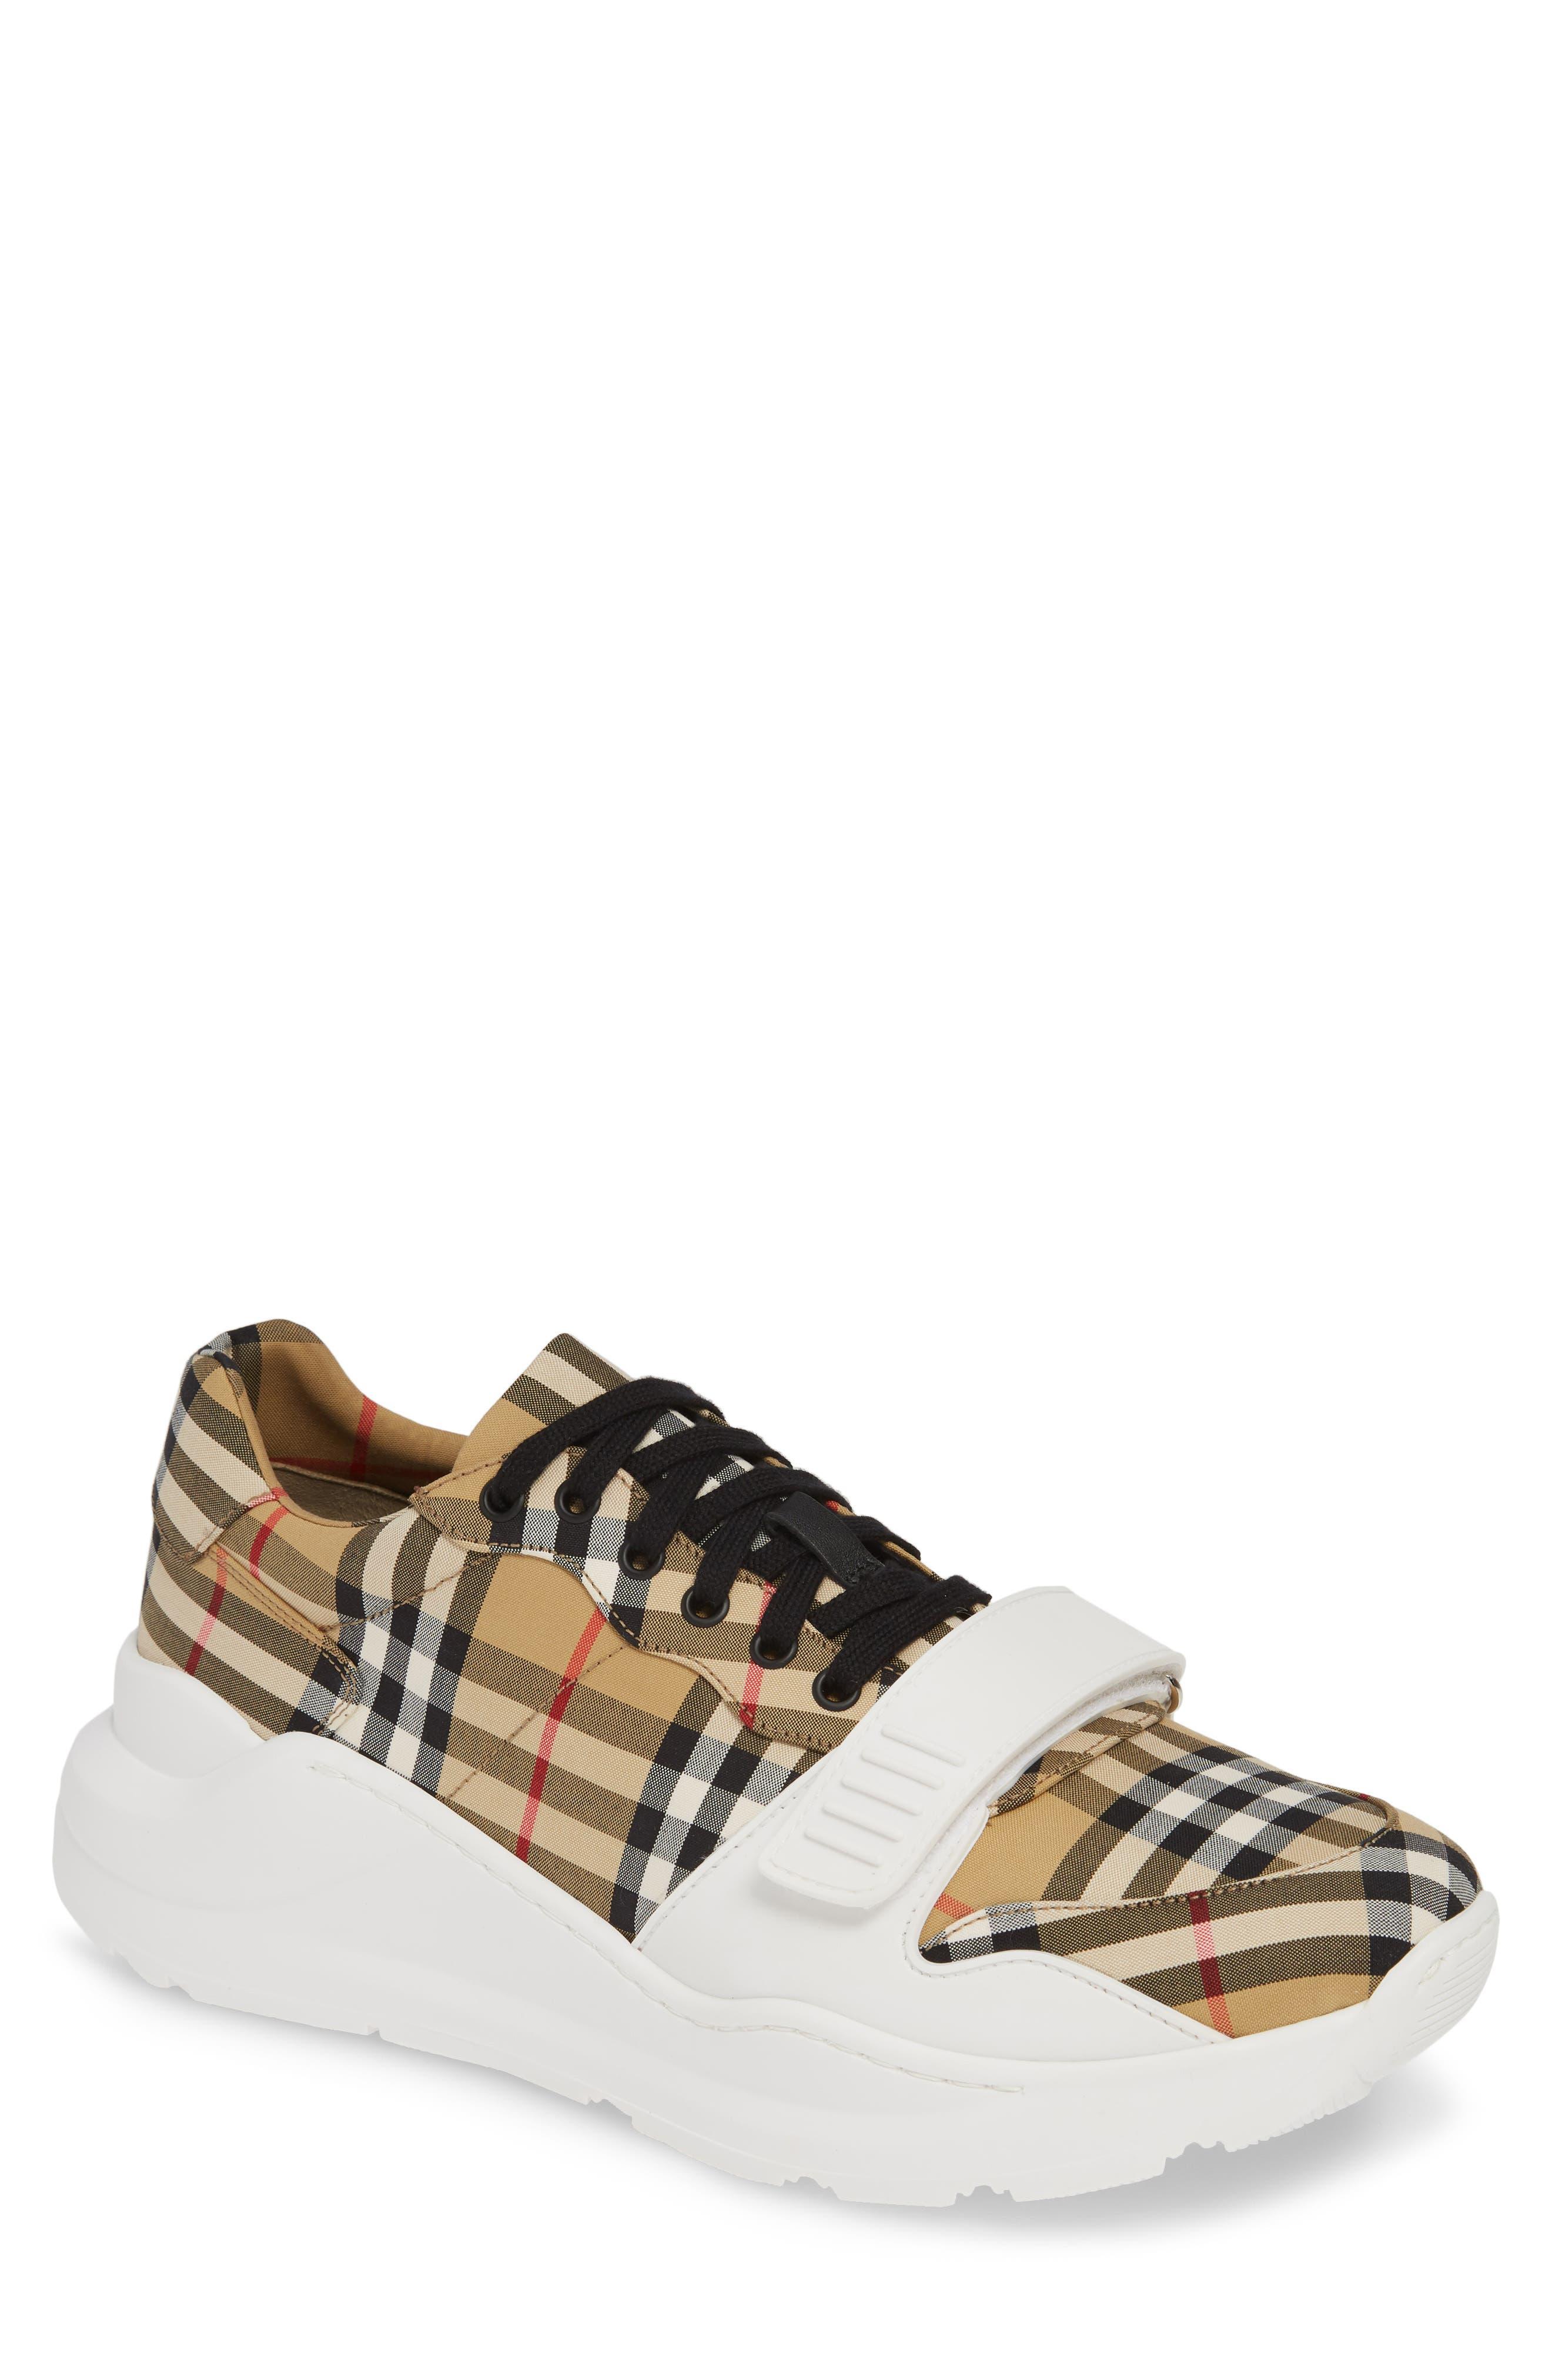 Men's Burberry Shoes   Nordstrom